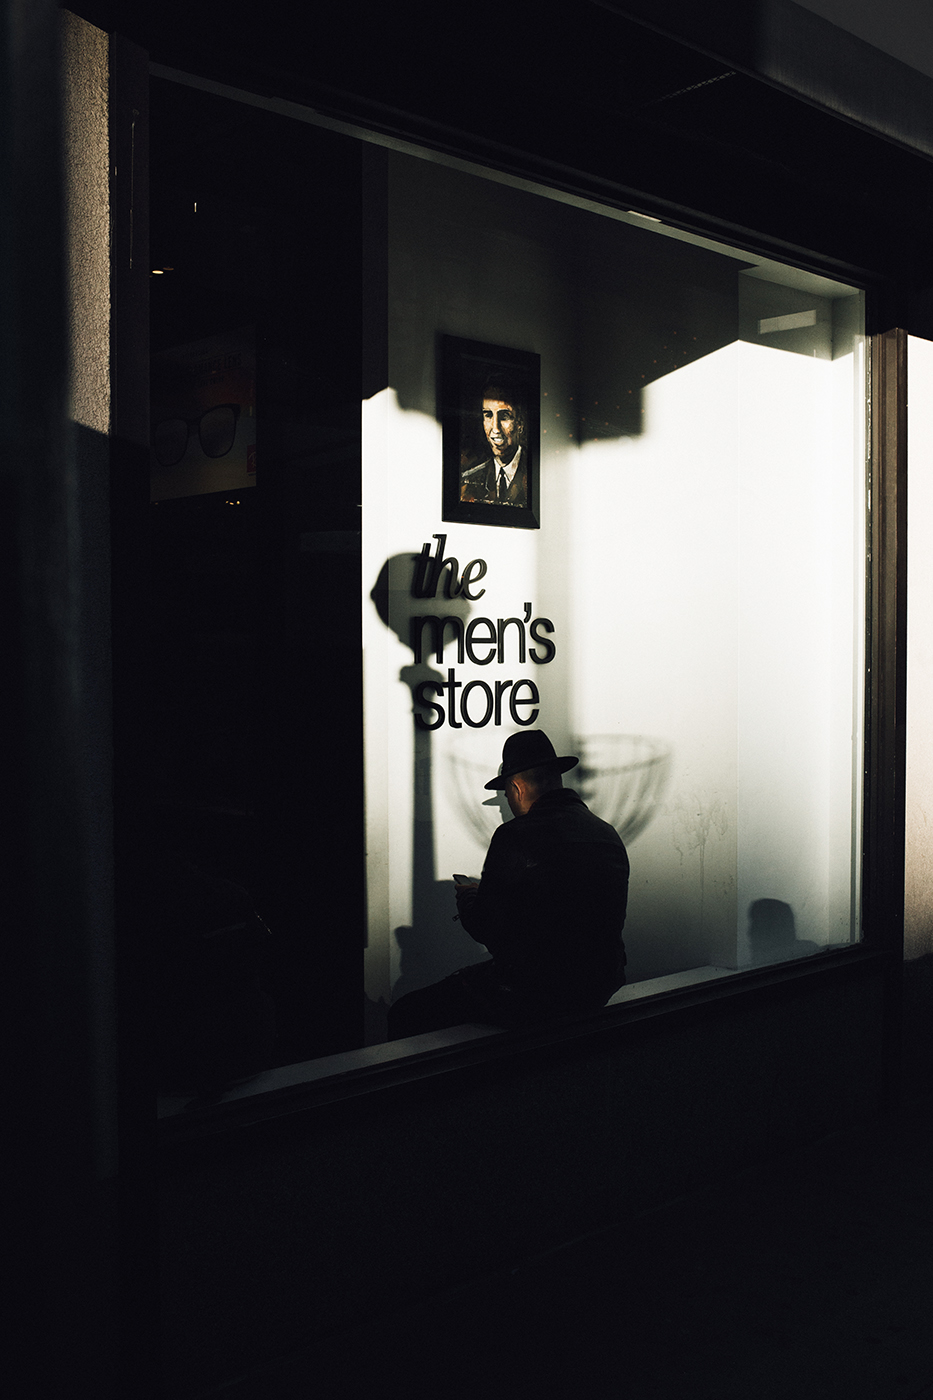 The Men's Store